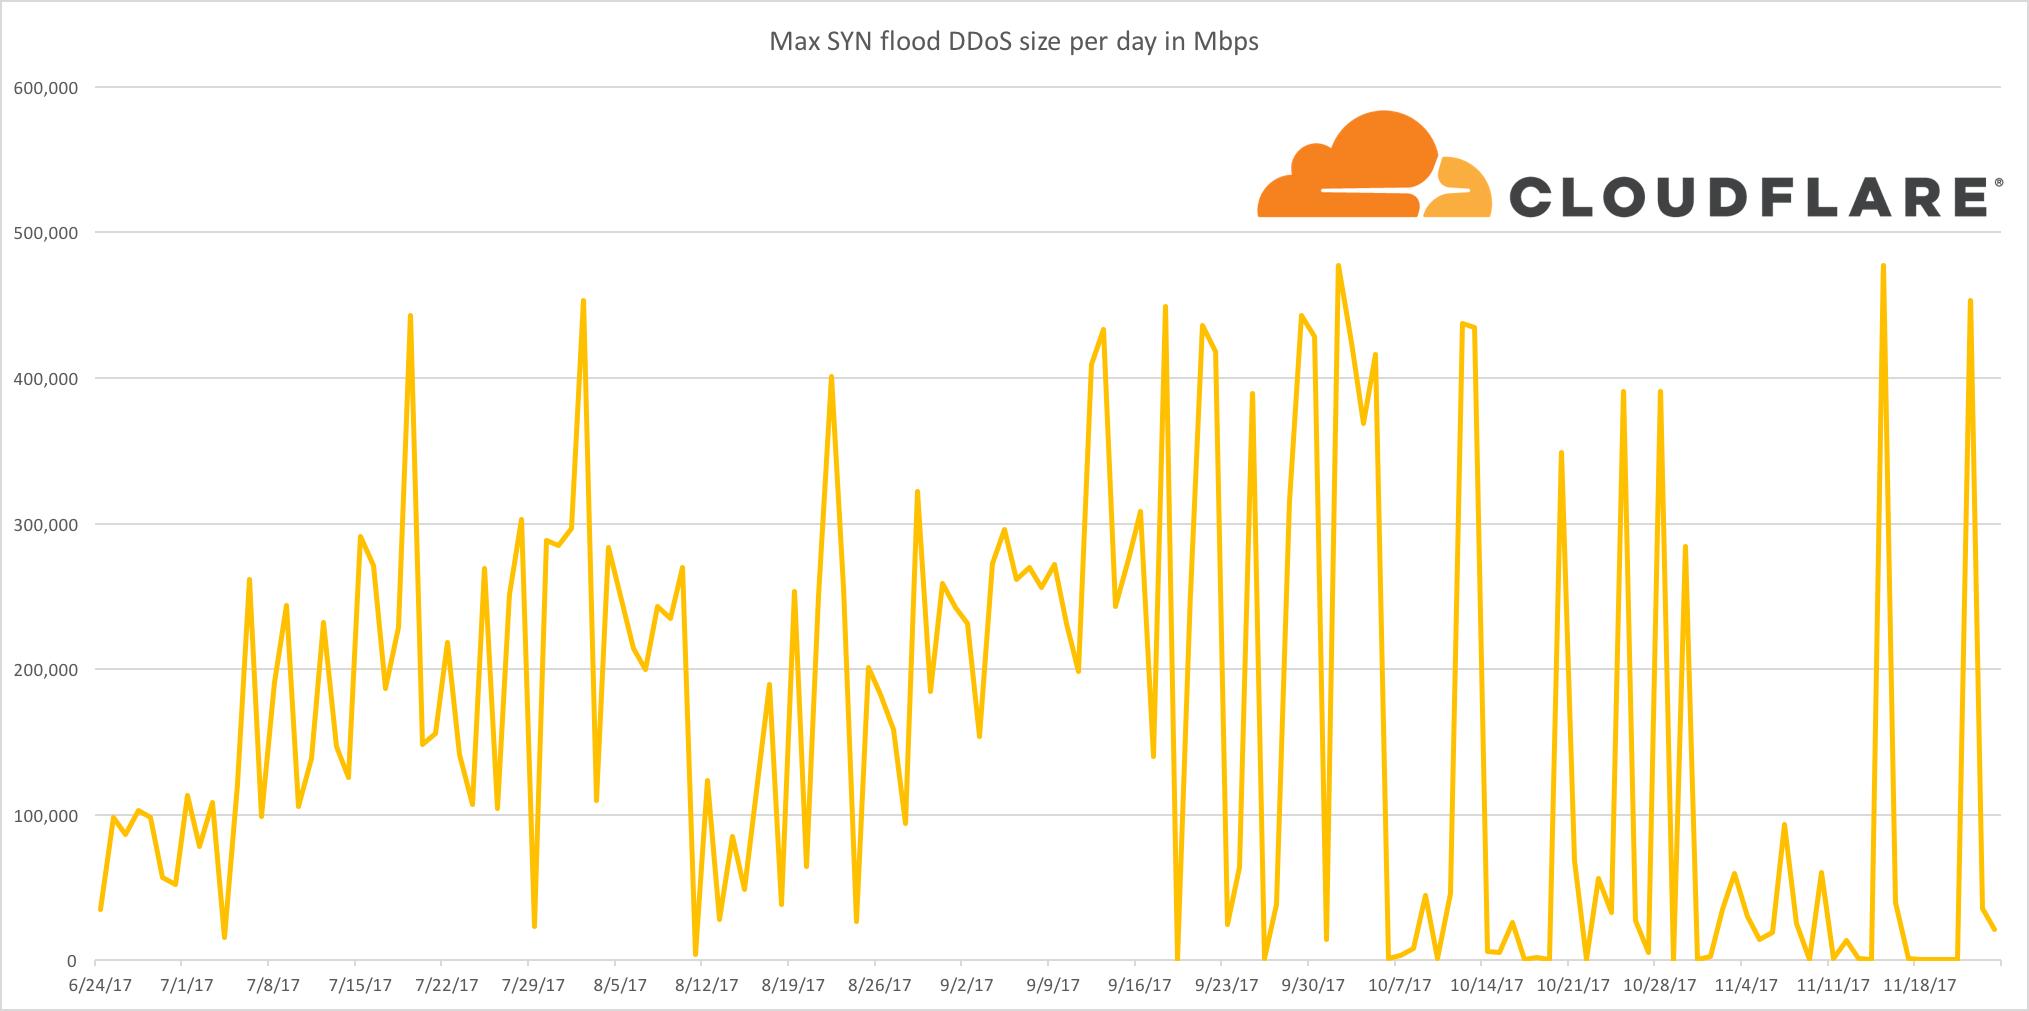 Cloudflare Reports Massive Slowdown in Network Level DDoS Attacks